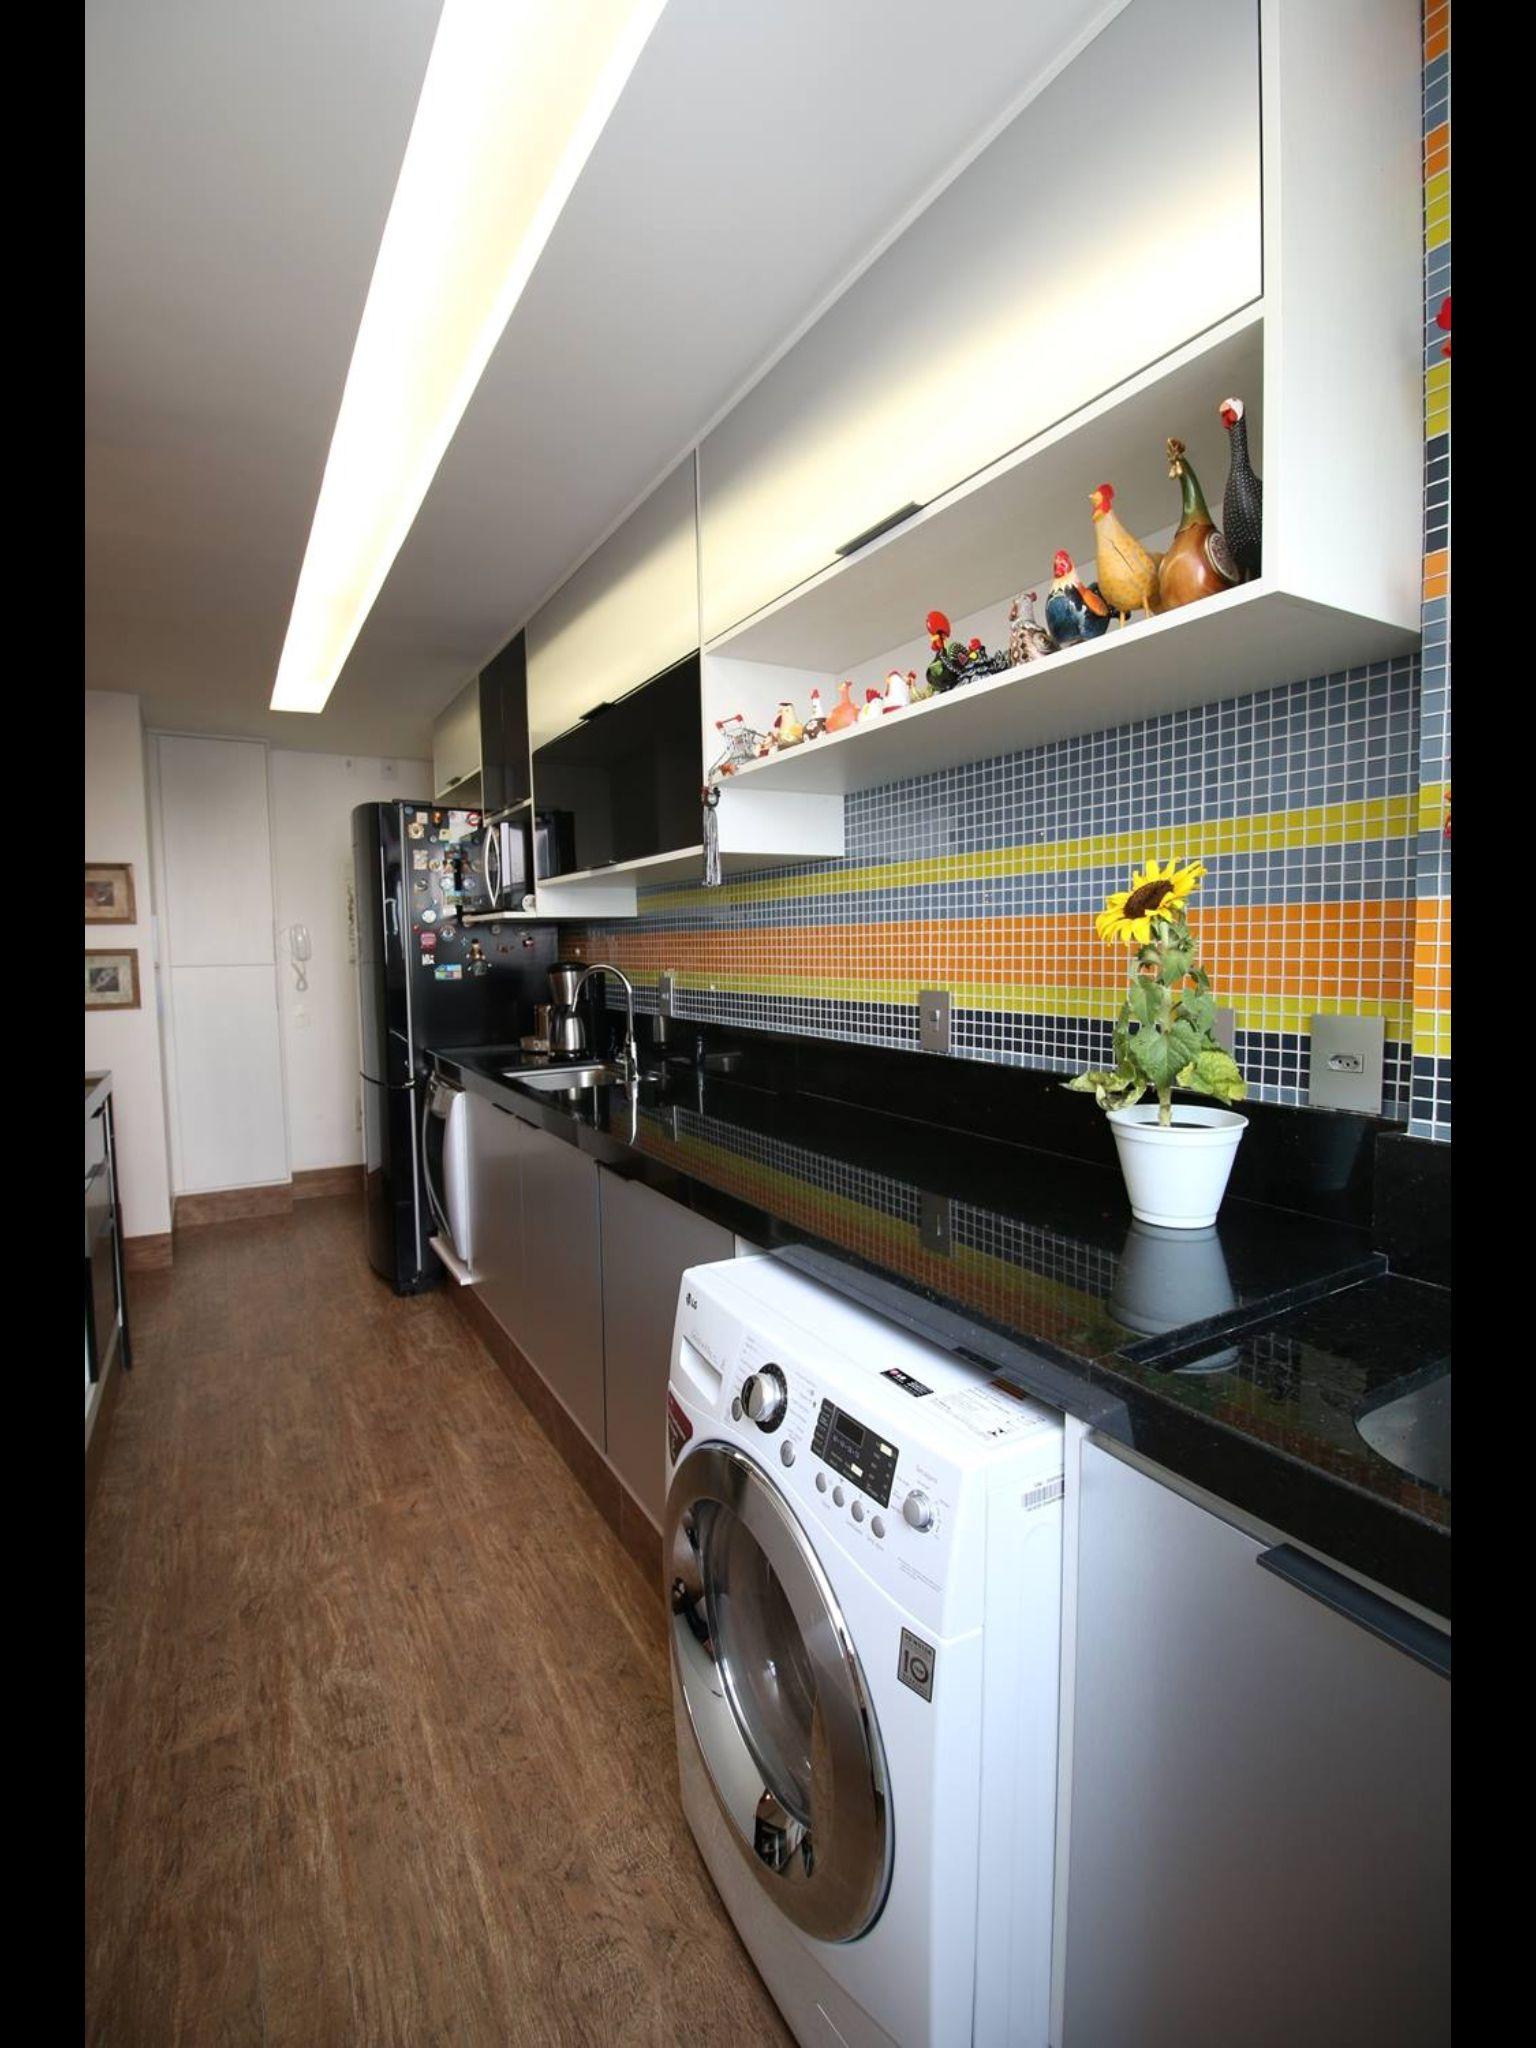 Cozinha e lavanderia juntas com luxo casa e decora o for Cocina y lavanderia juntas